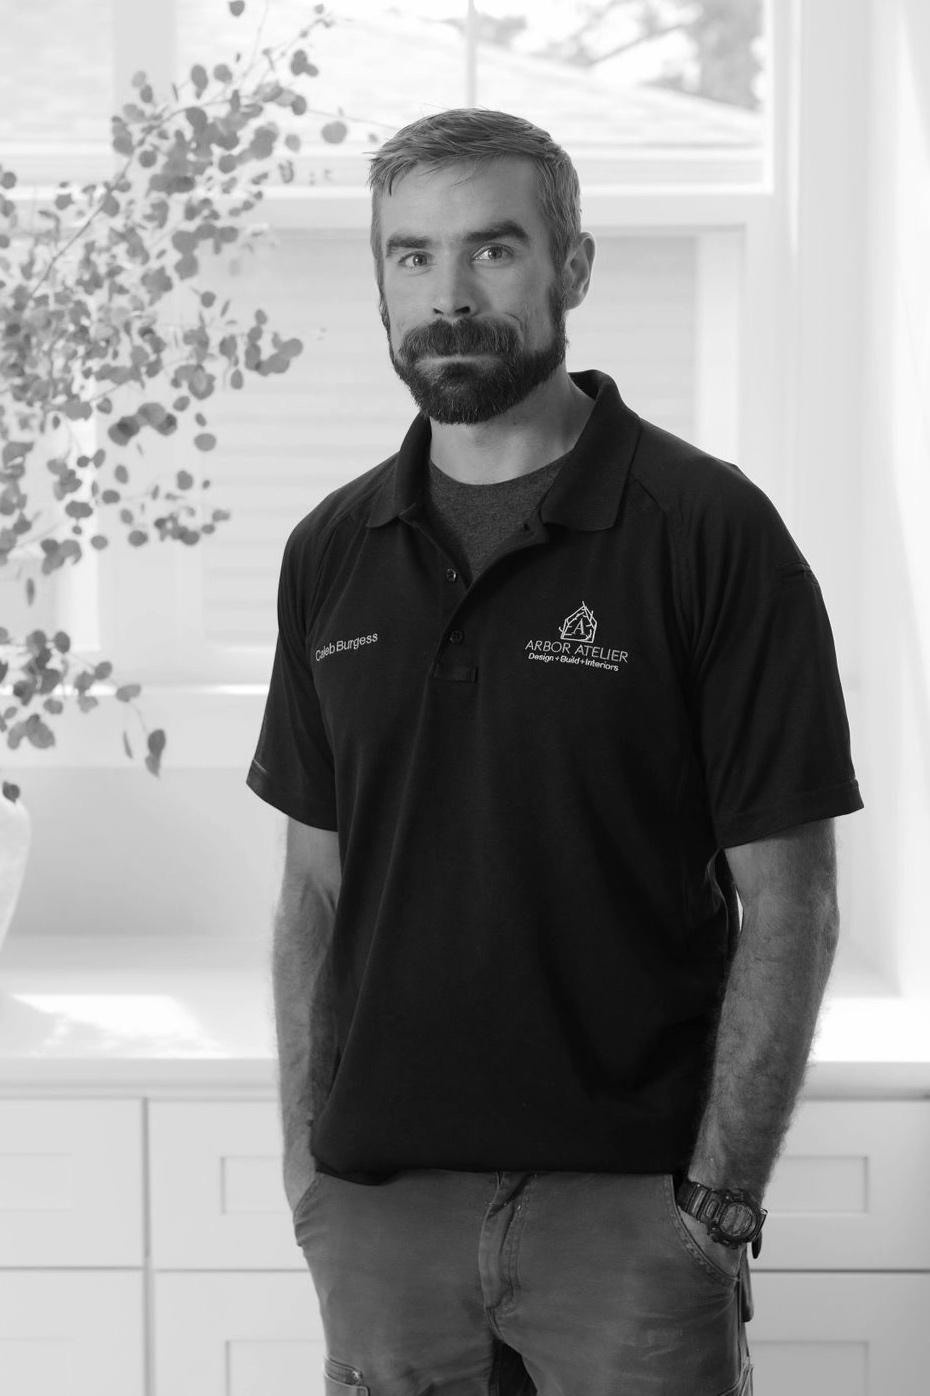 Caleb Burgess - Owner Licensed General Contractor #23026